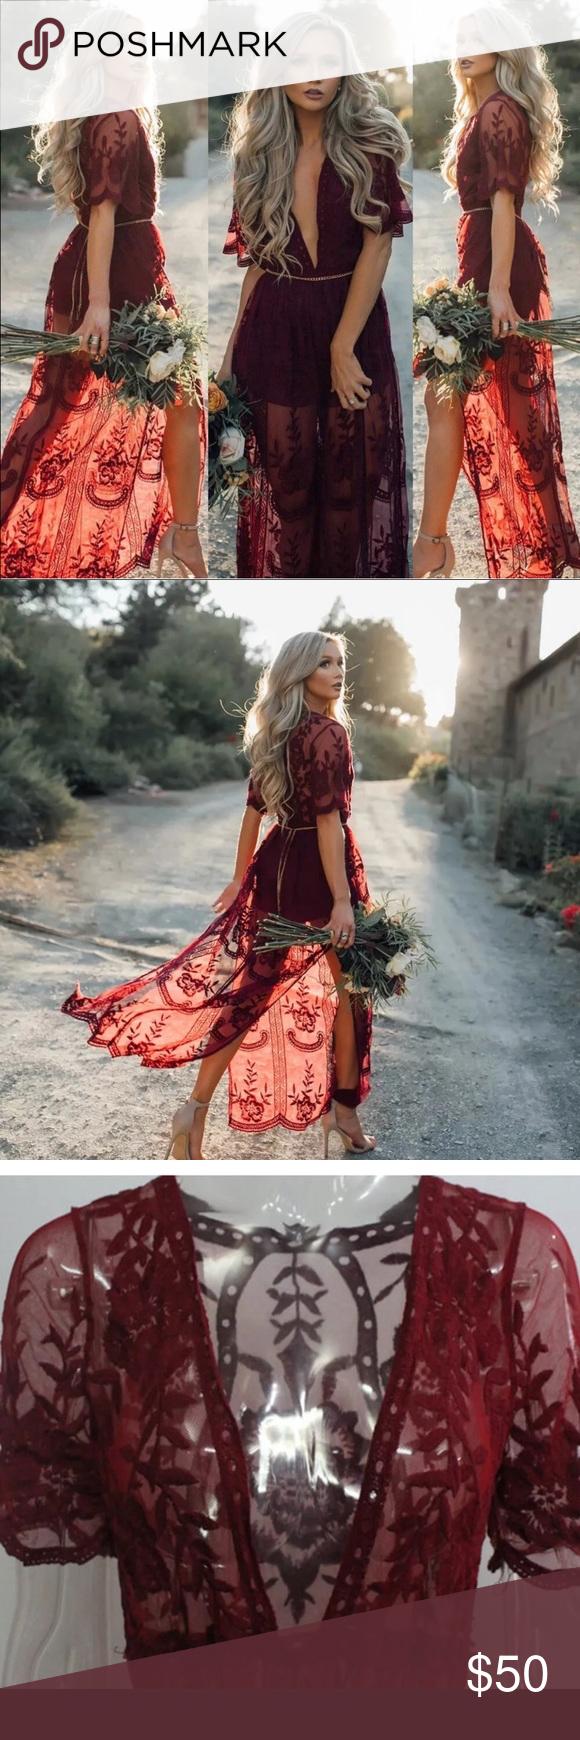 55f4ec5023 Wine Red Chain Lace Flowy Side Slit Maxi Dress Brand New Wine Red Floral  Maxi Dress